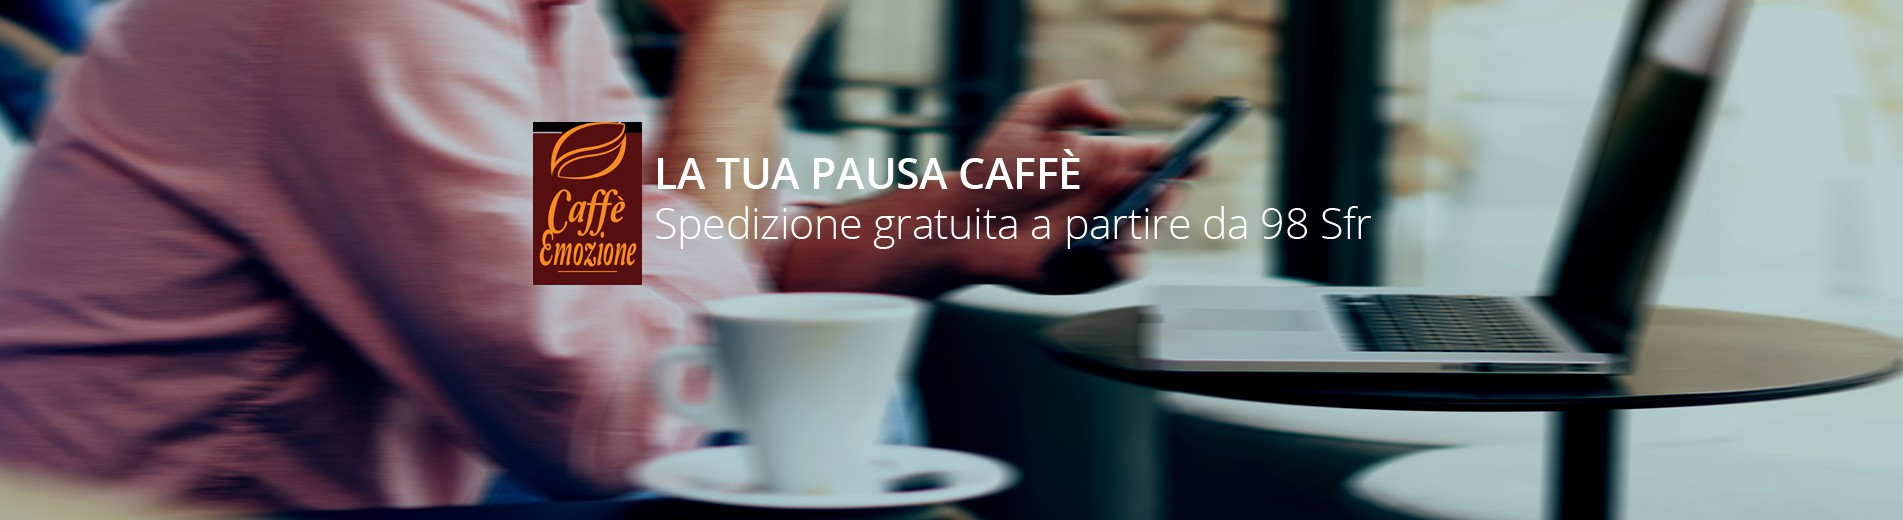 LA TUA PAUSA CAFFÈ